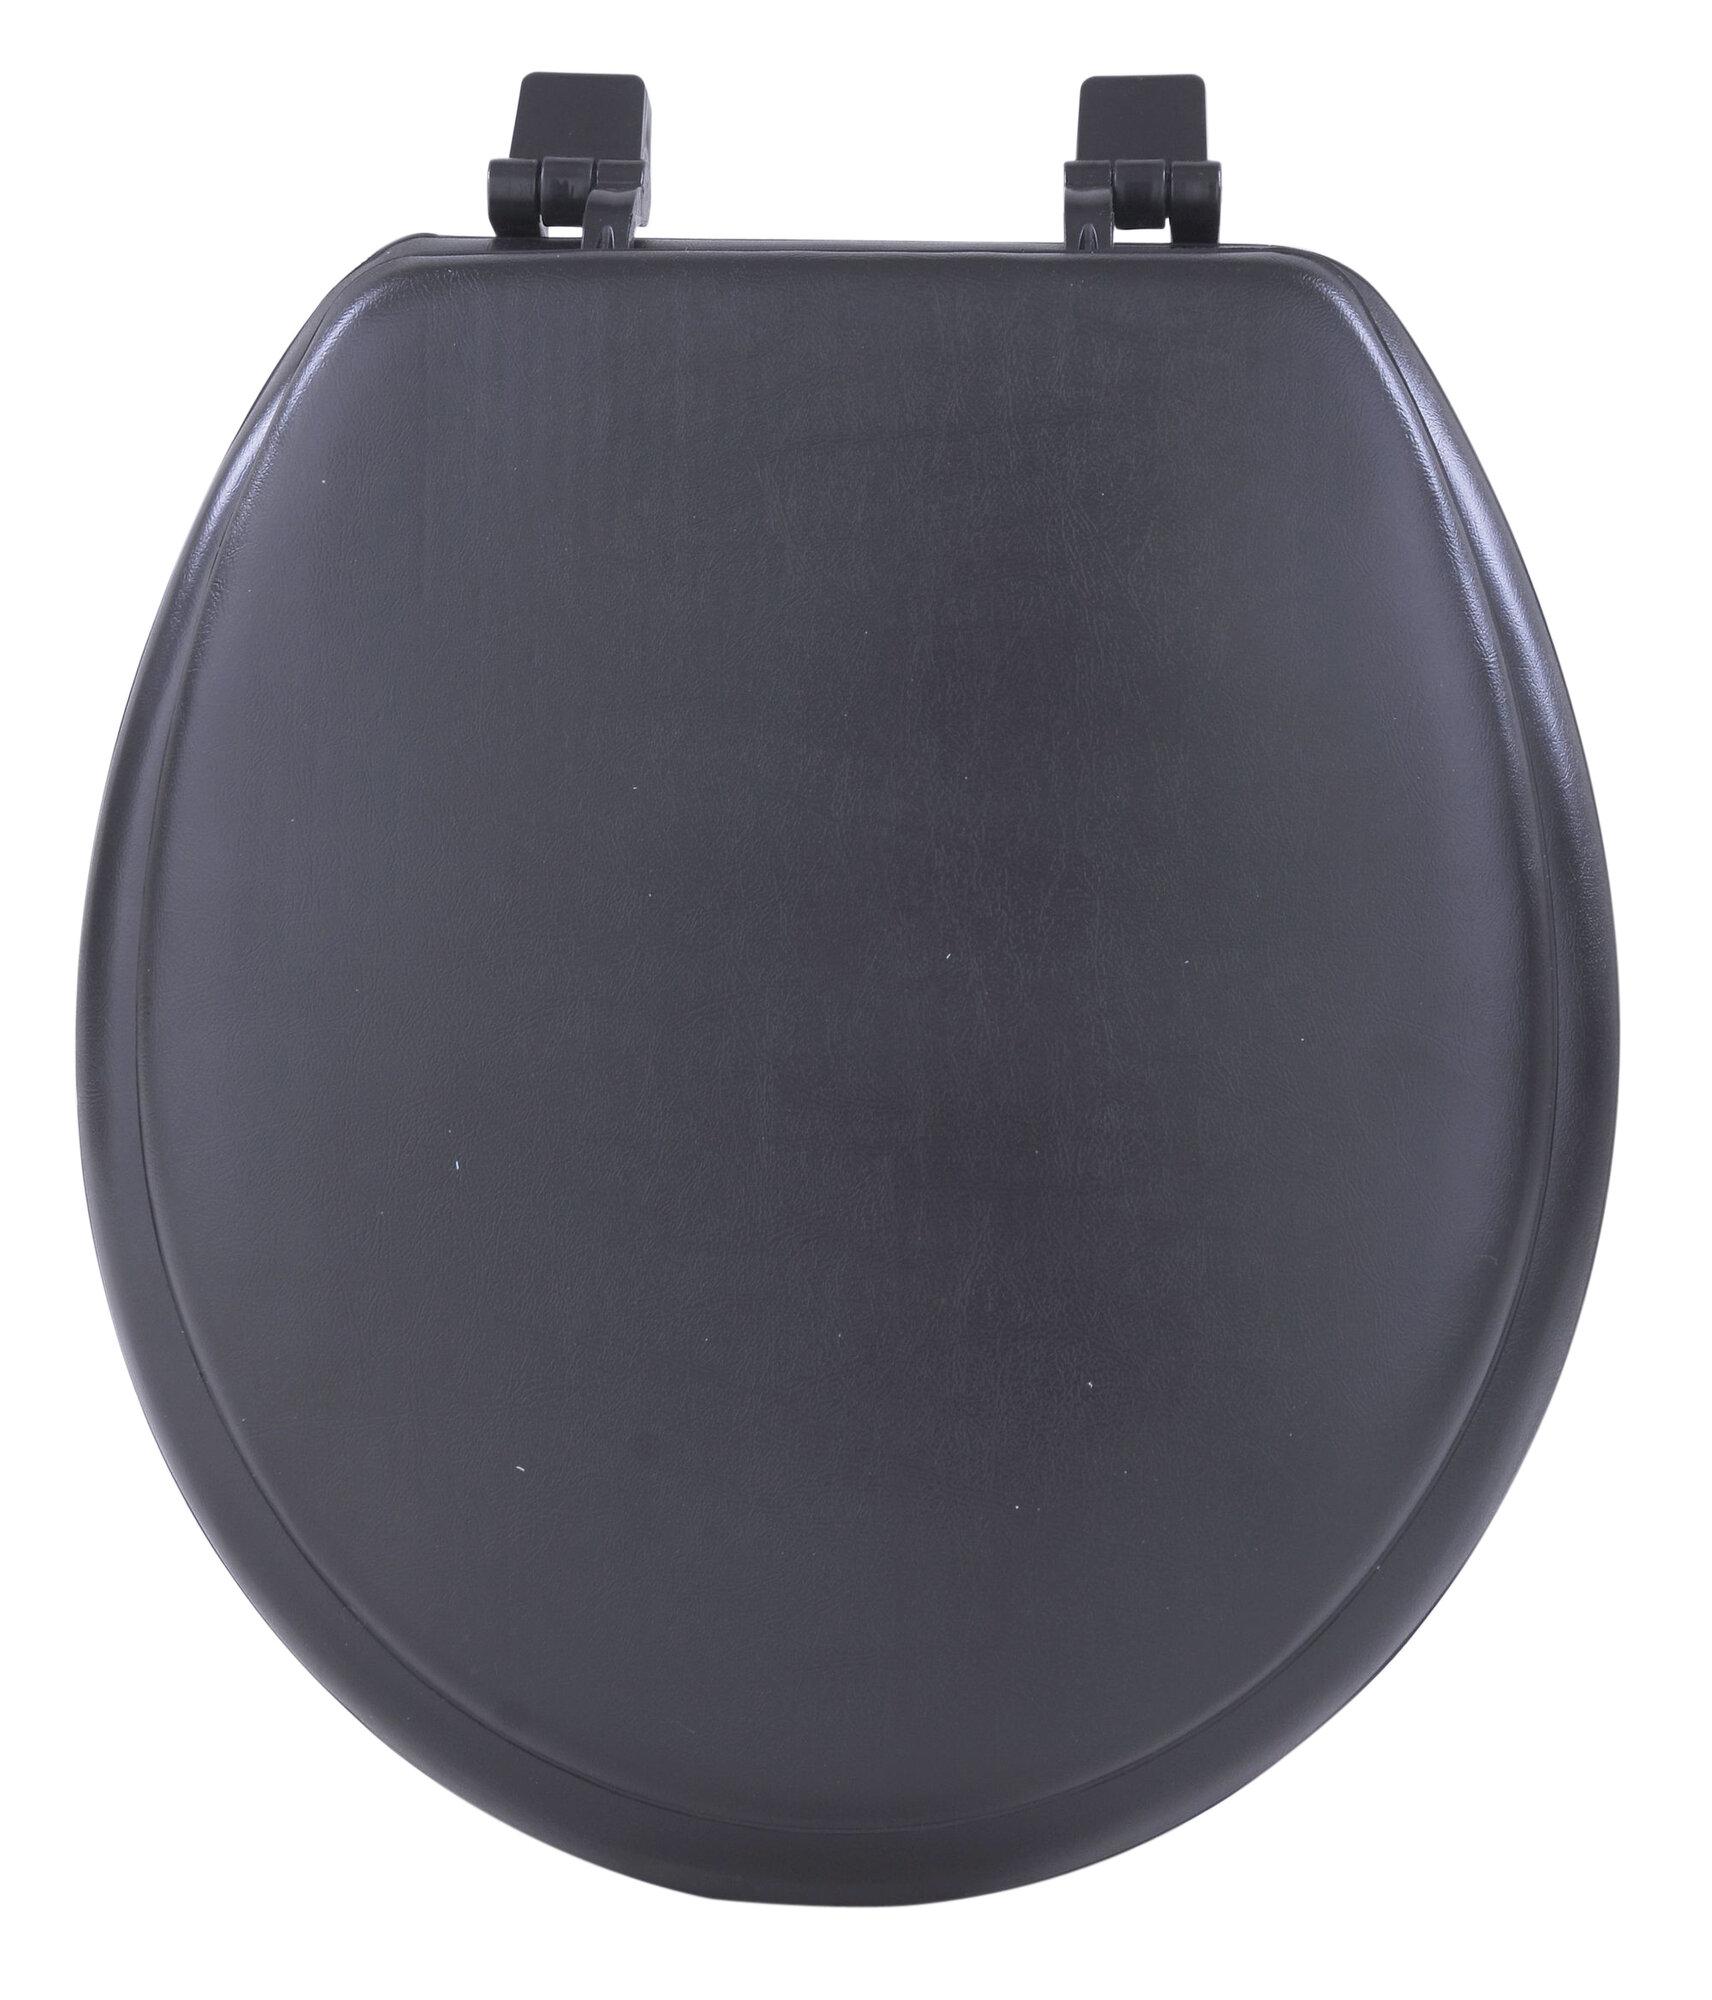 Achim Importing Co Fantasia Soft Standard Toilet Seat Ebay